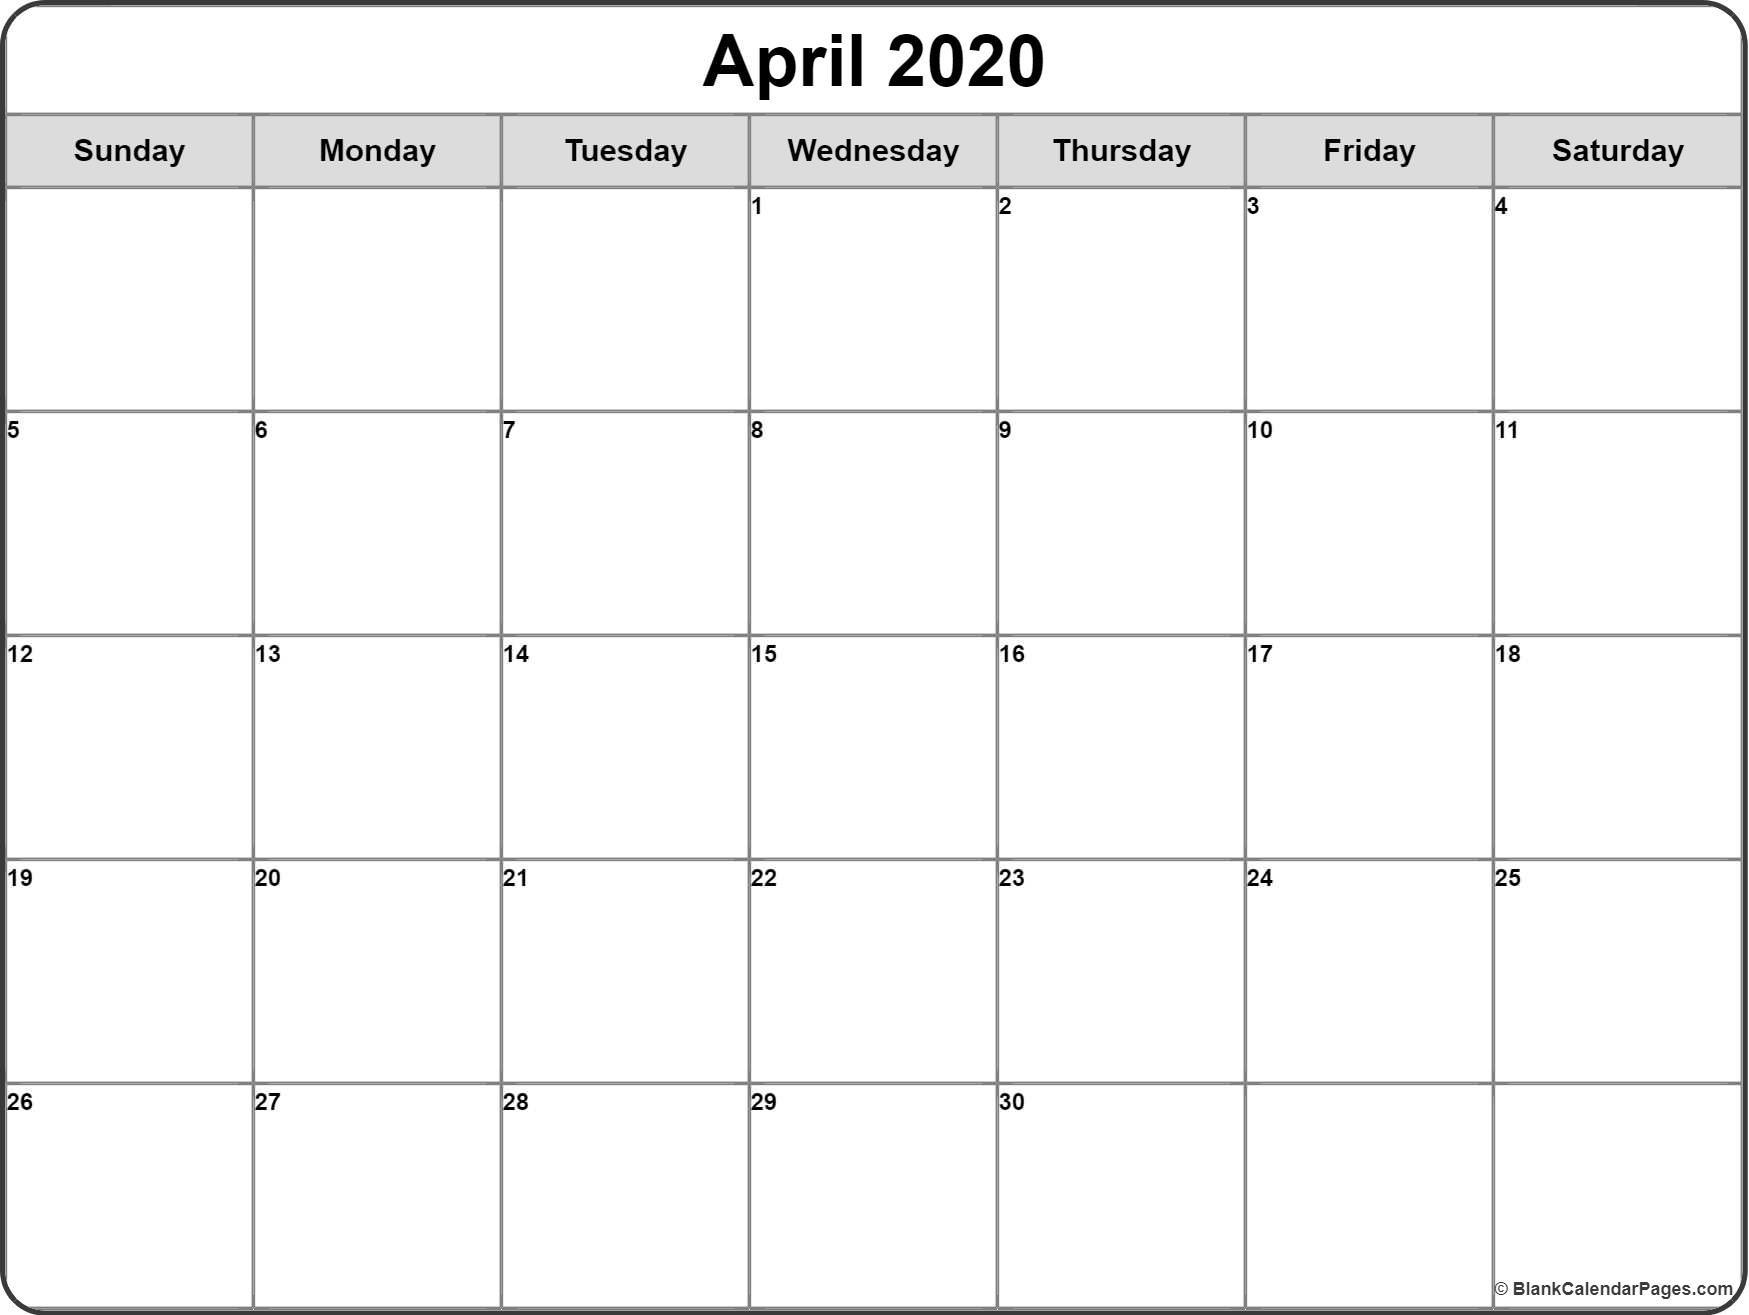 April 2020 Calendar   Free Printable Monthly Calendars-Fill In Calendar Template 2020